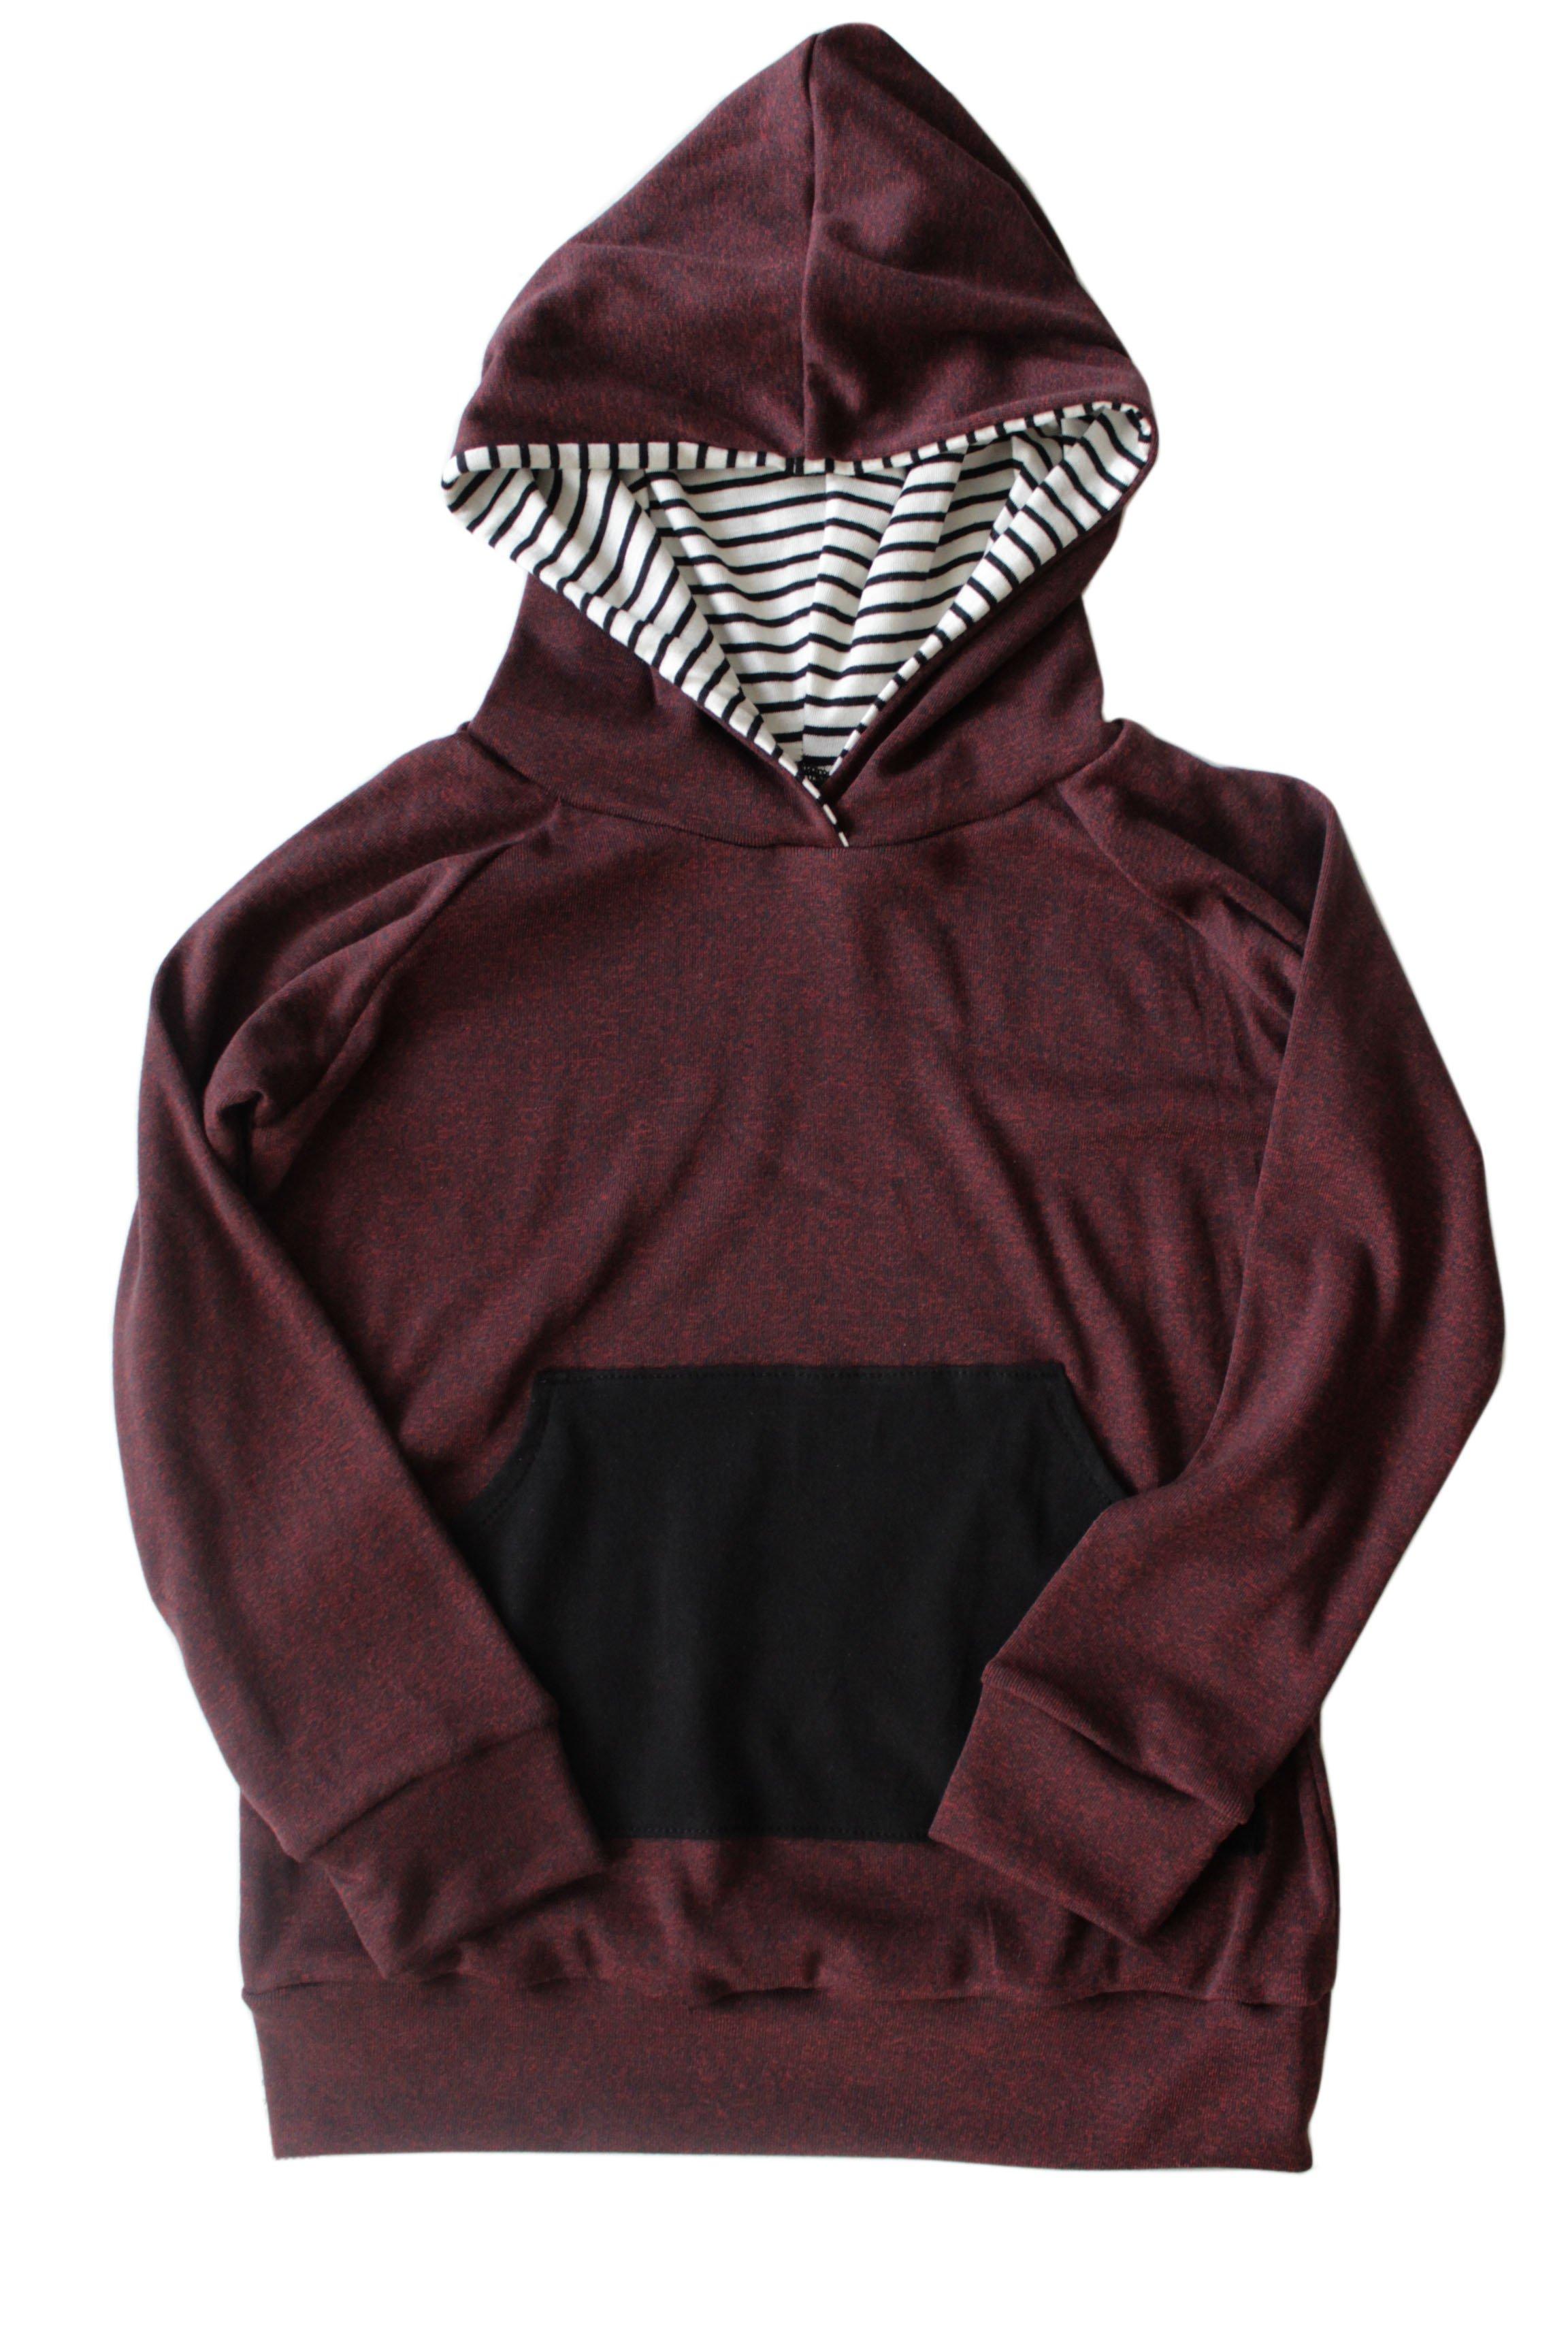 image of striped burgundy hoodie WZURGQV